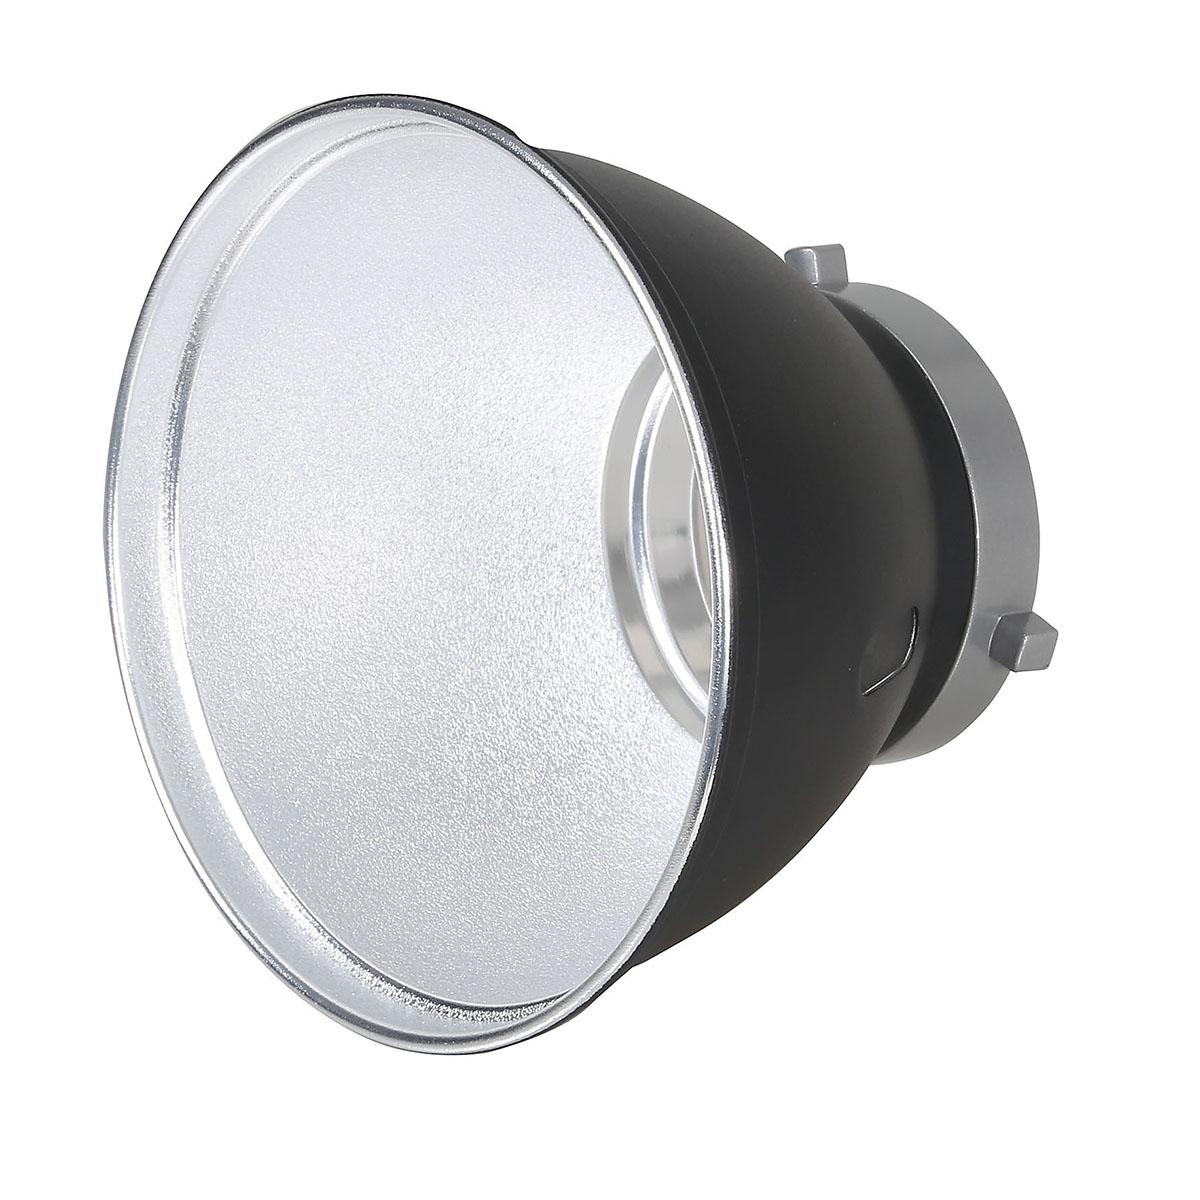 Phottix Studio Light Reflector (7″)